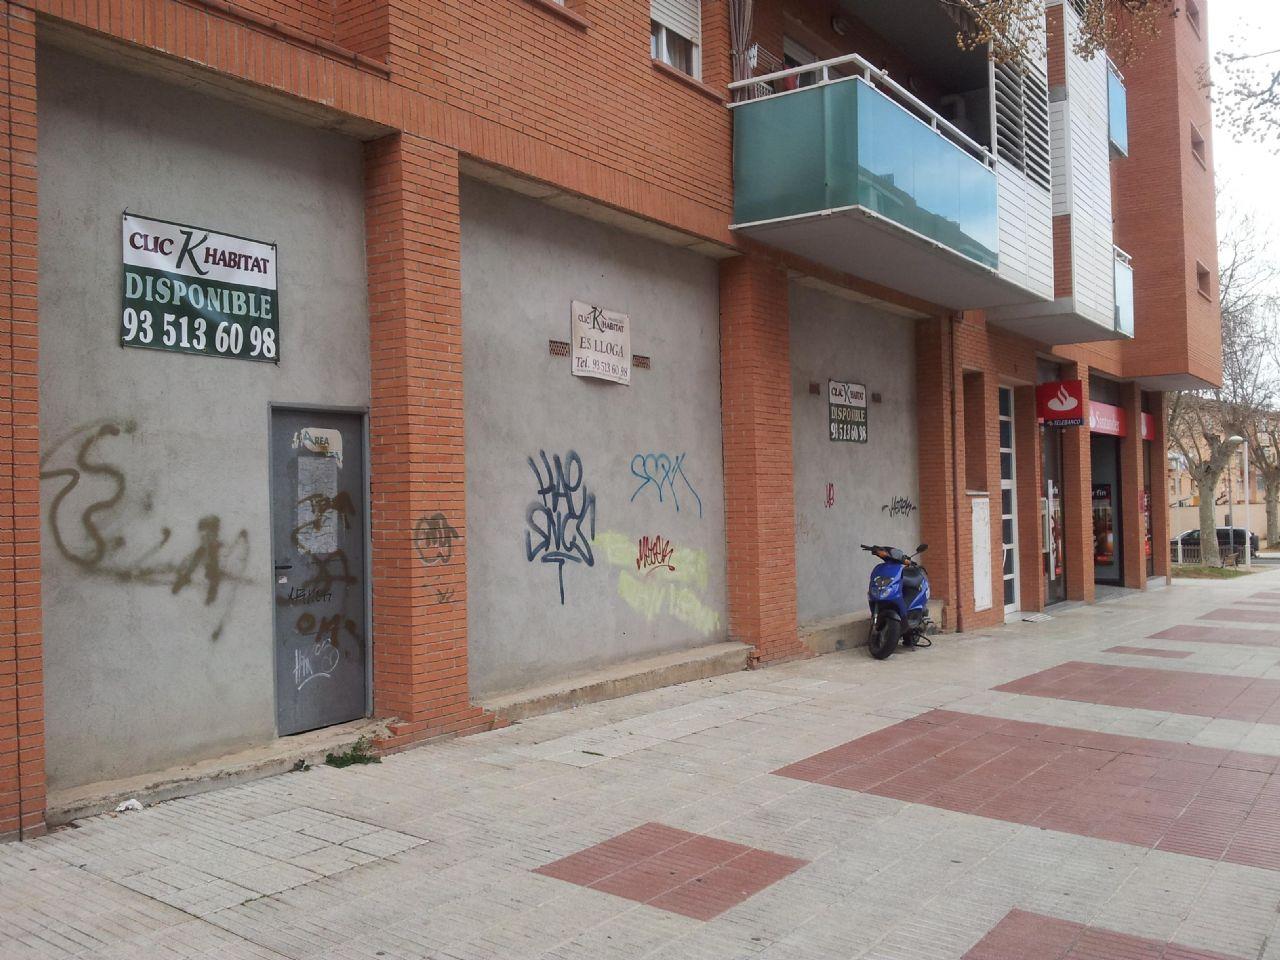 Commercial property in Malgrat de Mar, Avd. Mediterranea, for sale